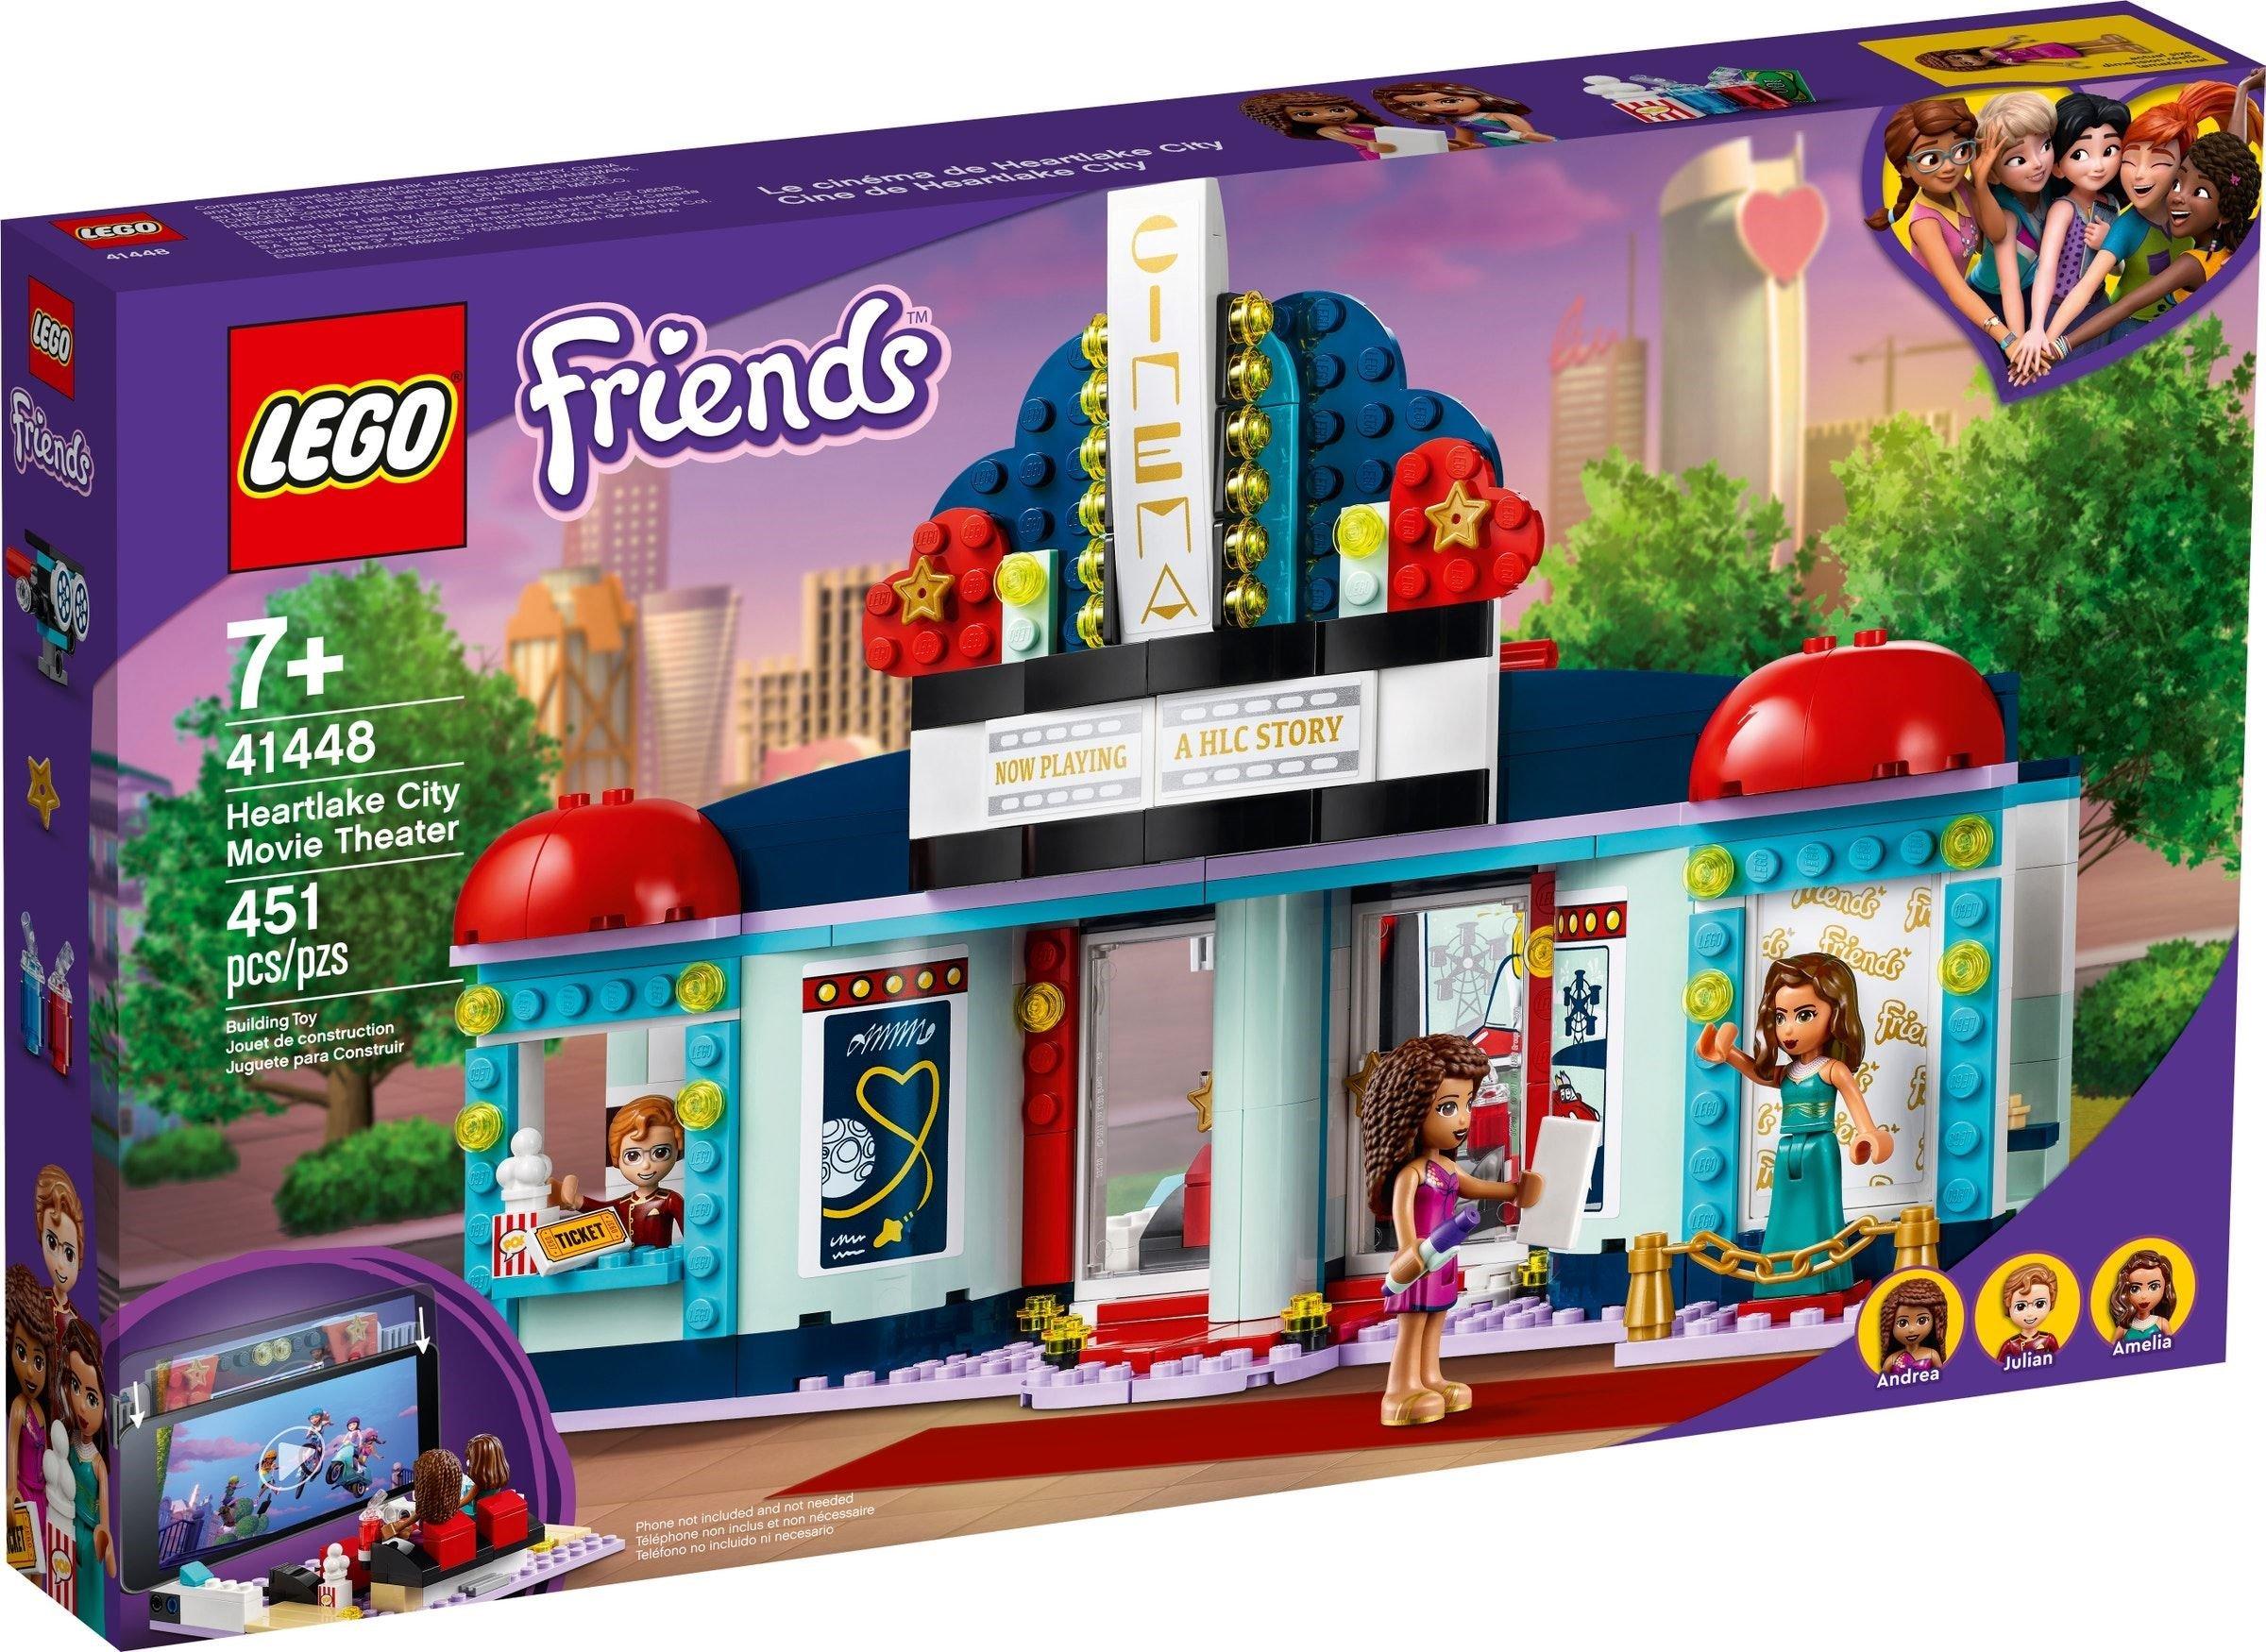 LEGO Friends - Heartlake City Movie Theater (41448)